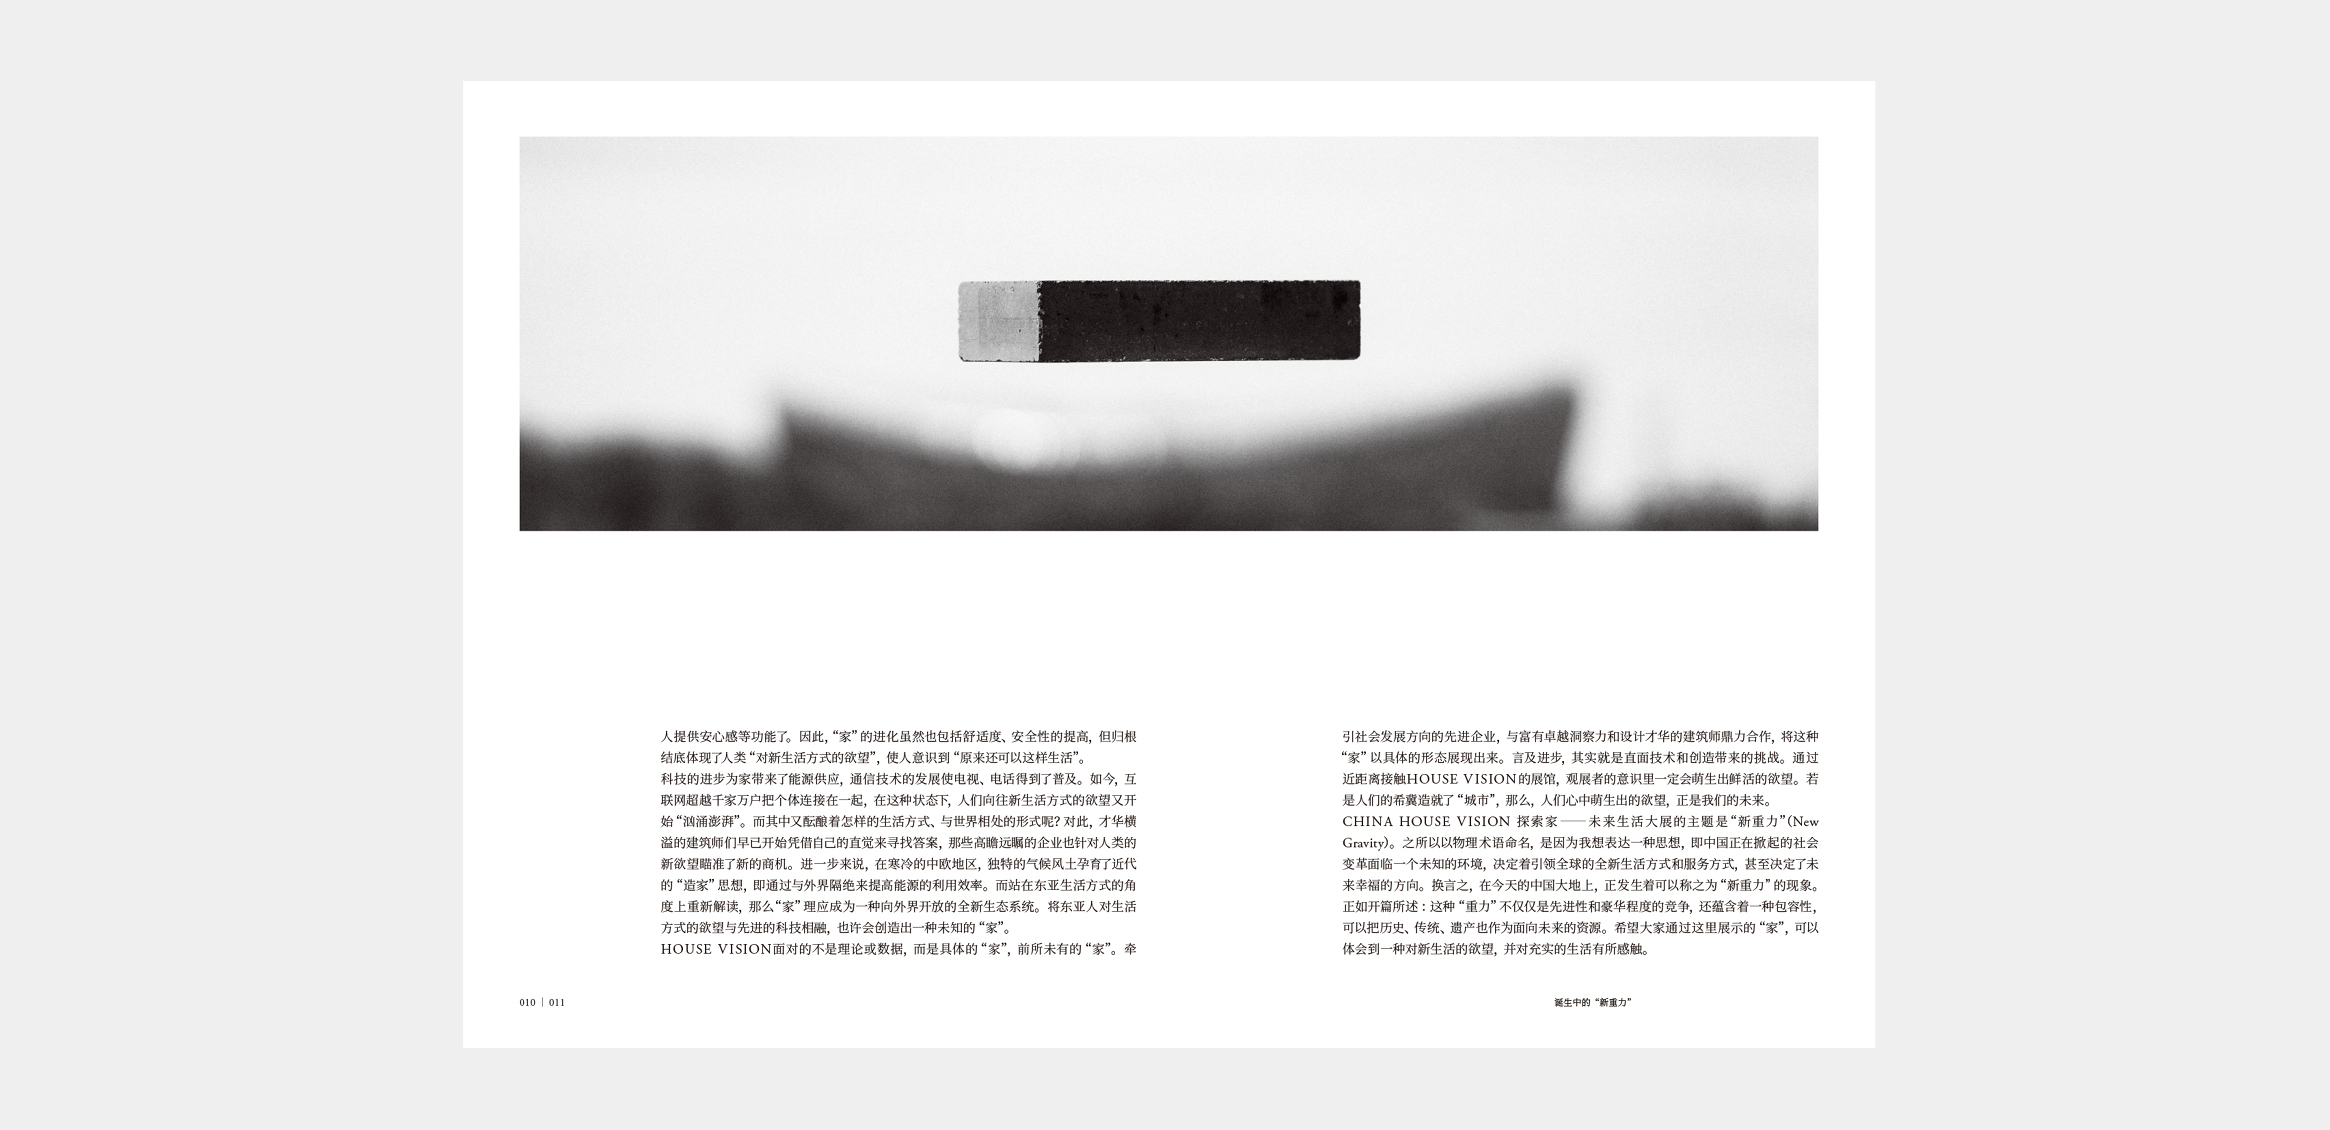 HOUSE VISION 2018 BEIJING EXHIBITION展覧会書籍1枚目